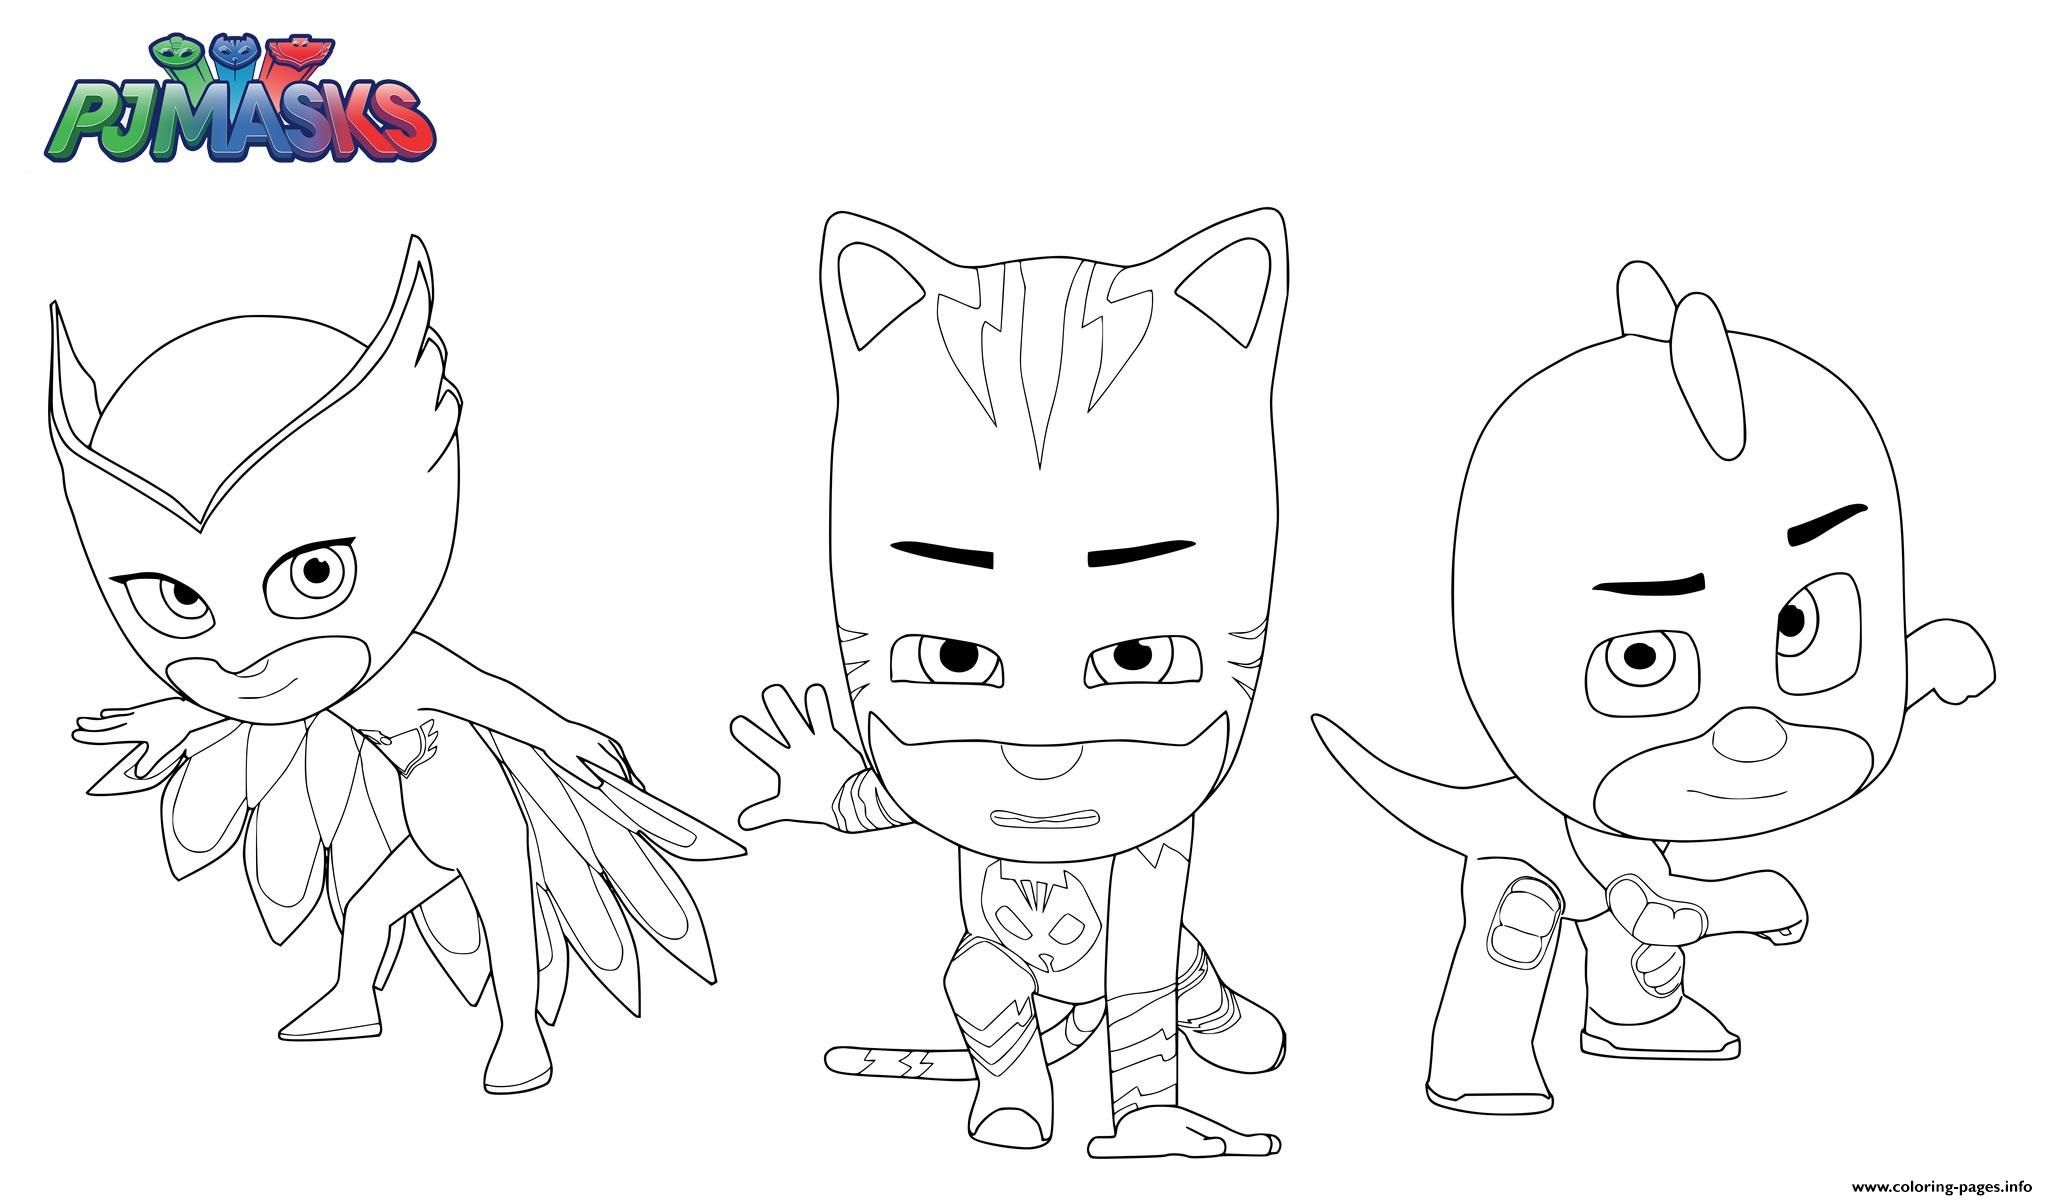 Print Pj Masks Superheroes Coloring Pages Pj Masks Coloring